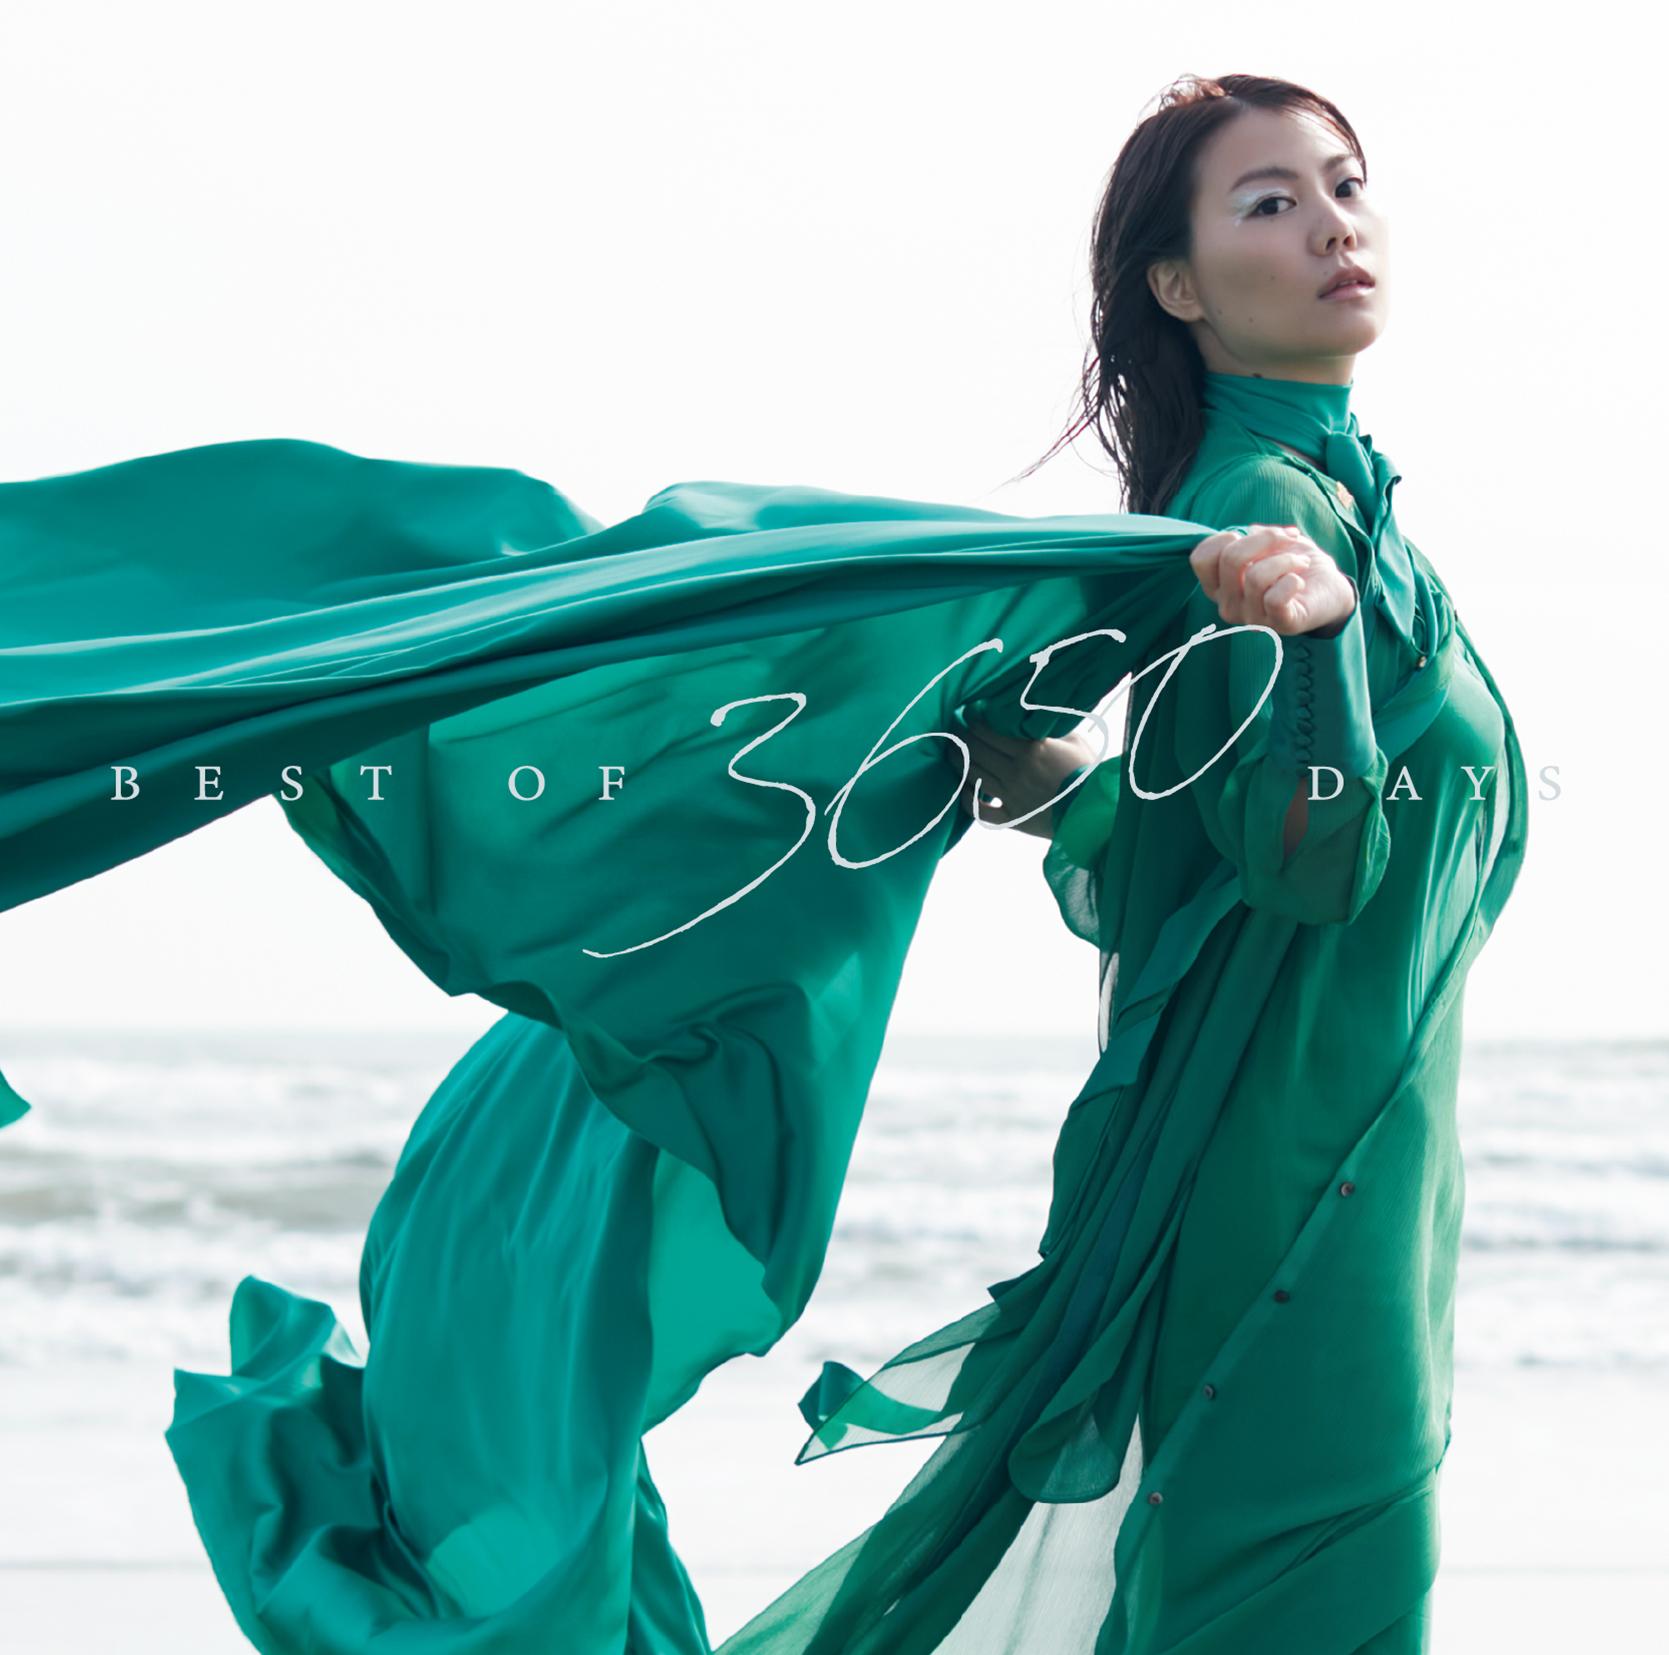 THE SxPLAY(菅原紗由理)、初ベスト盤「BEST OF 3650 DAYS」収録曲&ジャケット公開!リリース記念ライブも決定